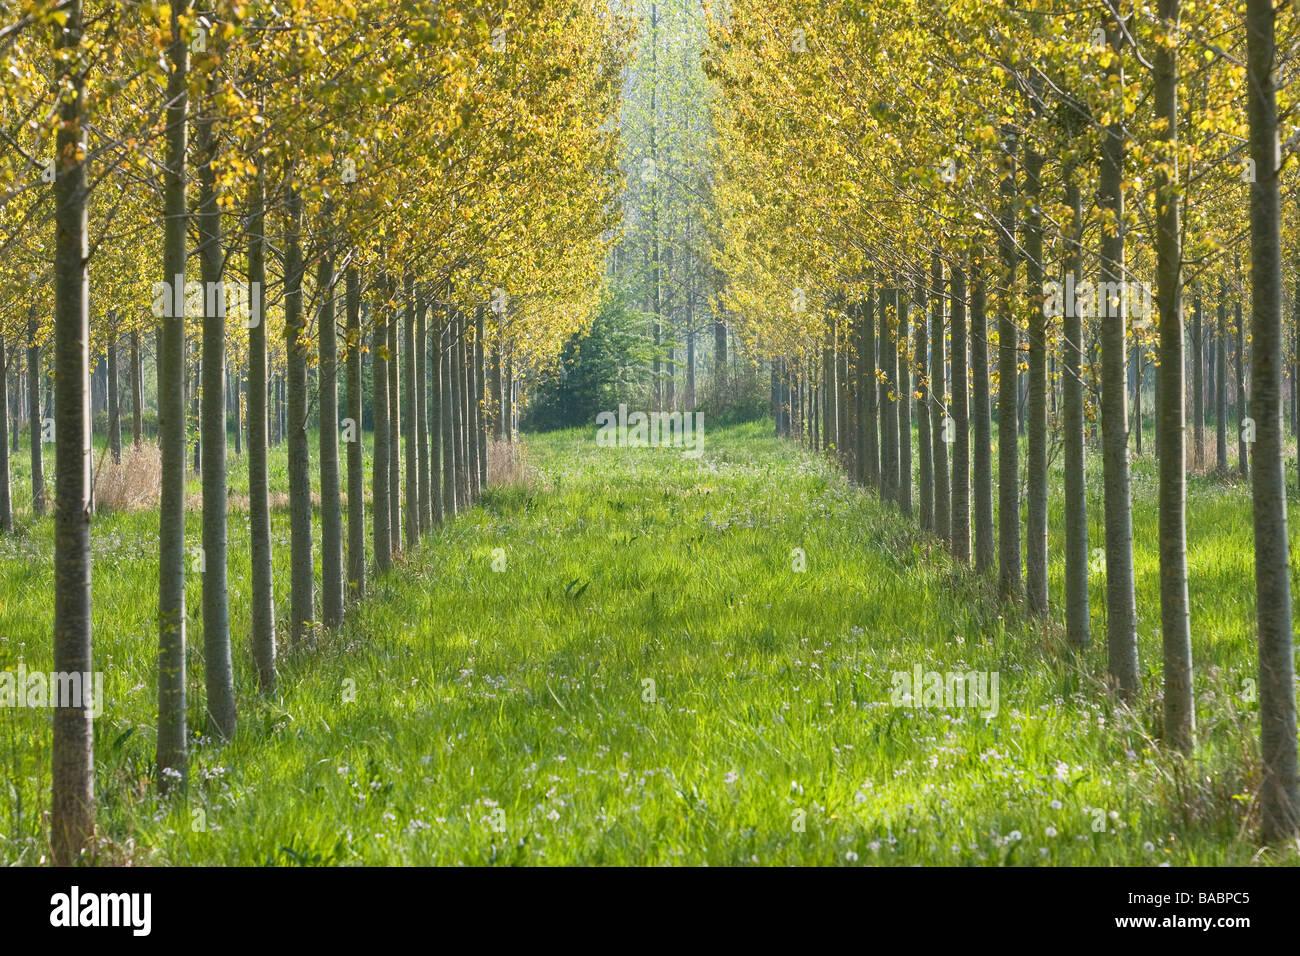 Pappel Baum Plantage Stockbild